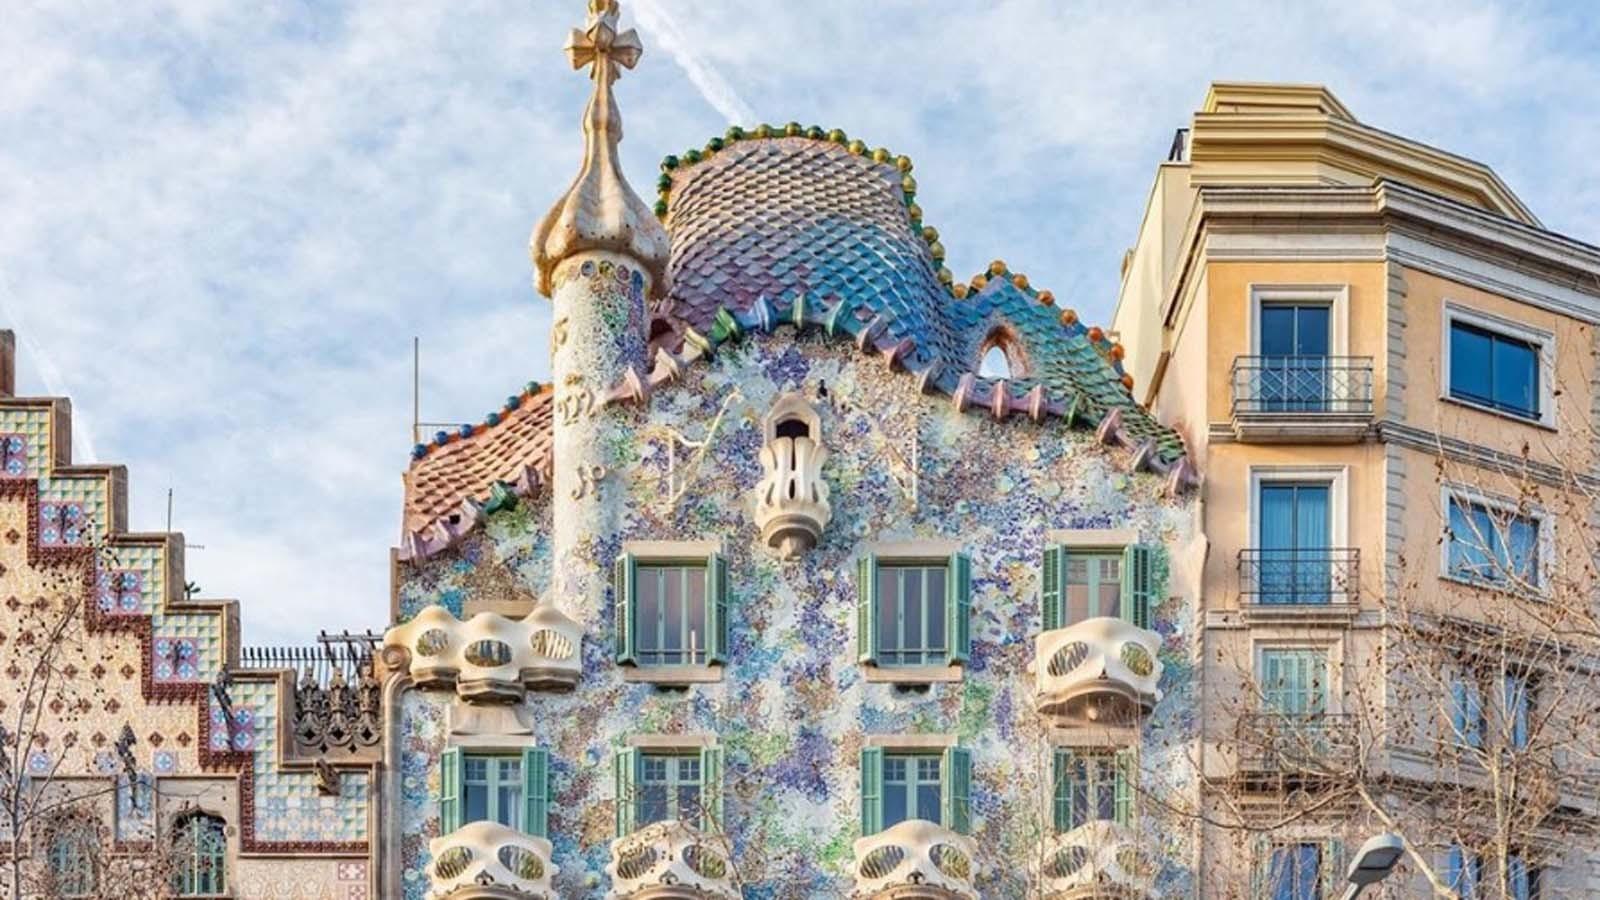 Casa Batlló -tickets to visit the Casa Batlló (Antoni Gaudí)